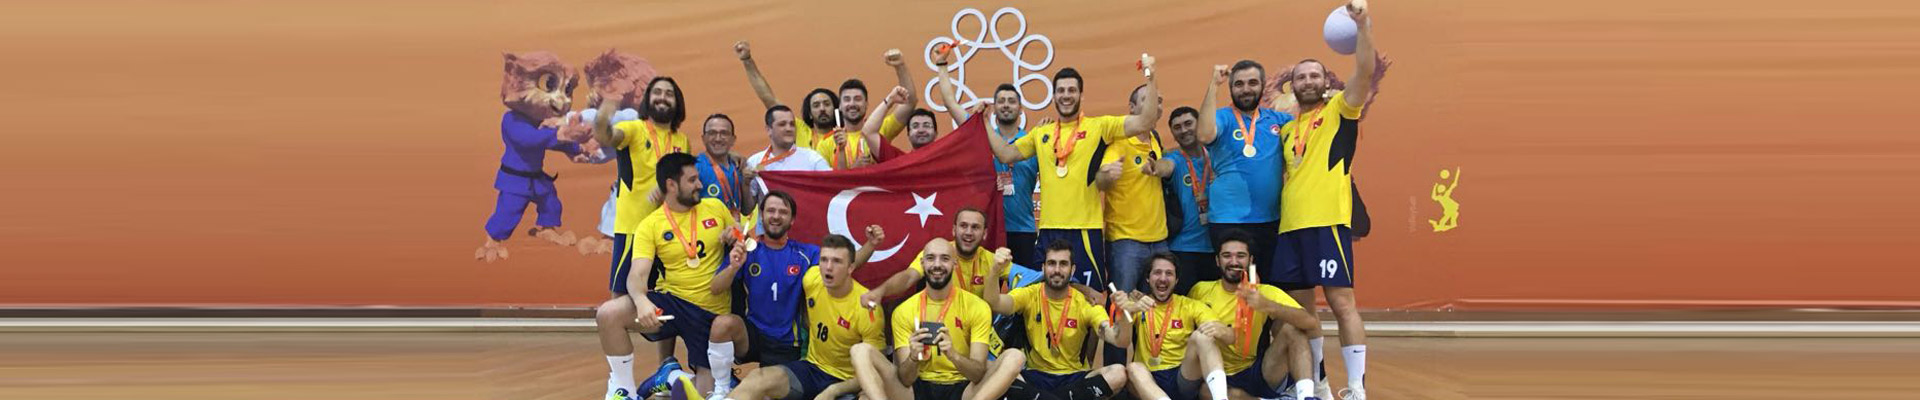 Avrupa Şampiyonu Beykent Aday